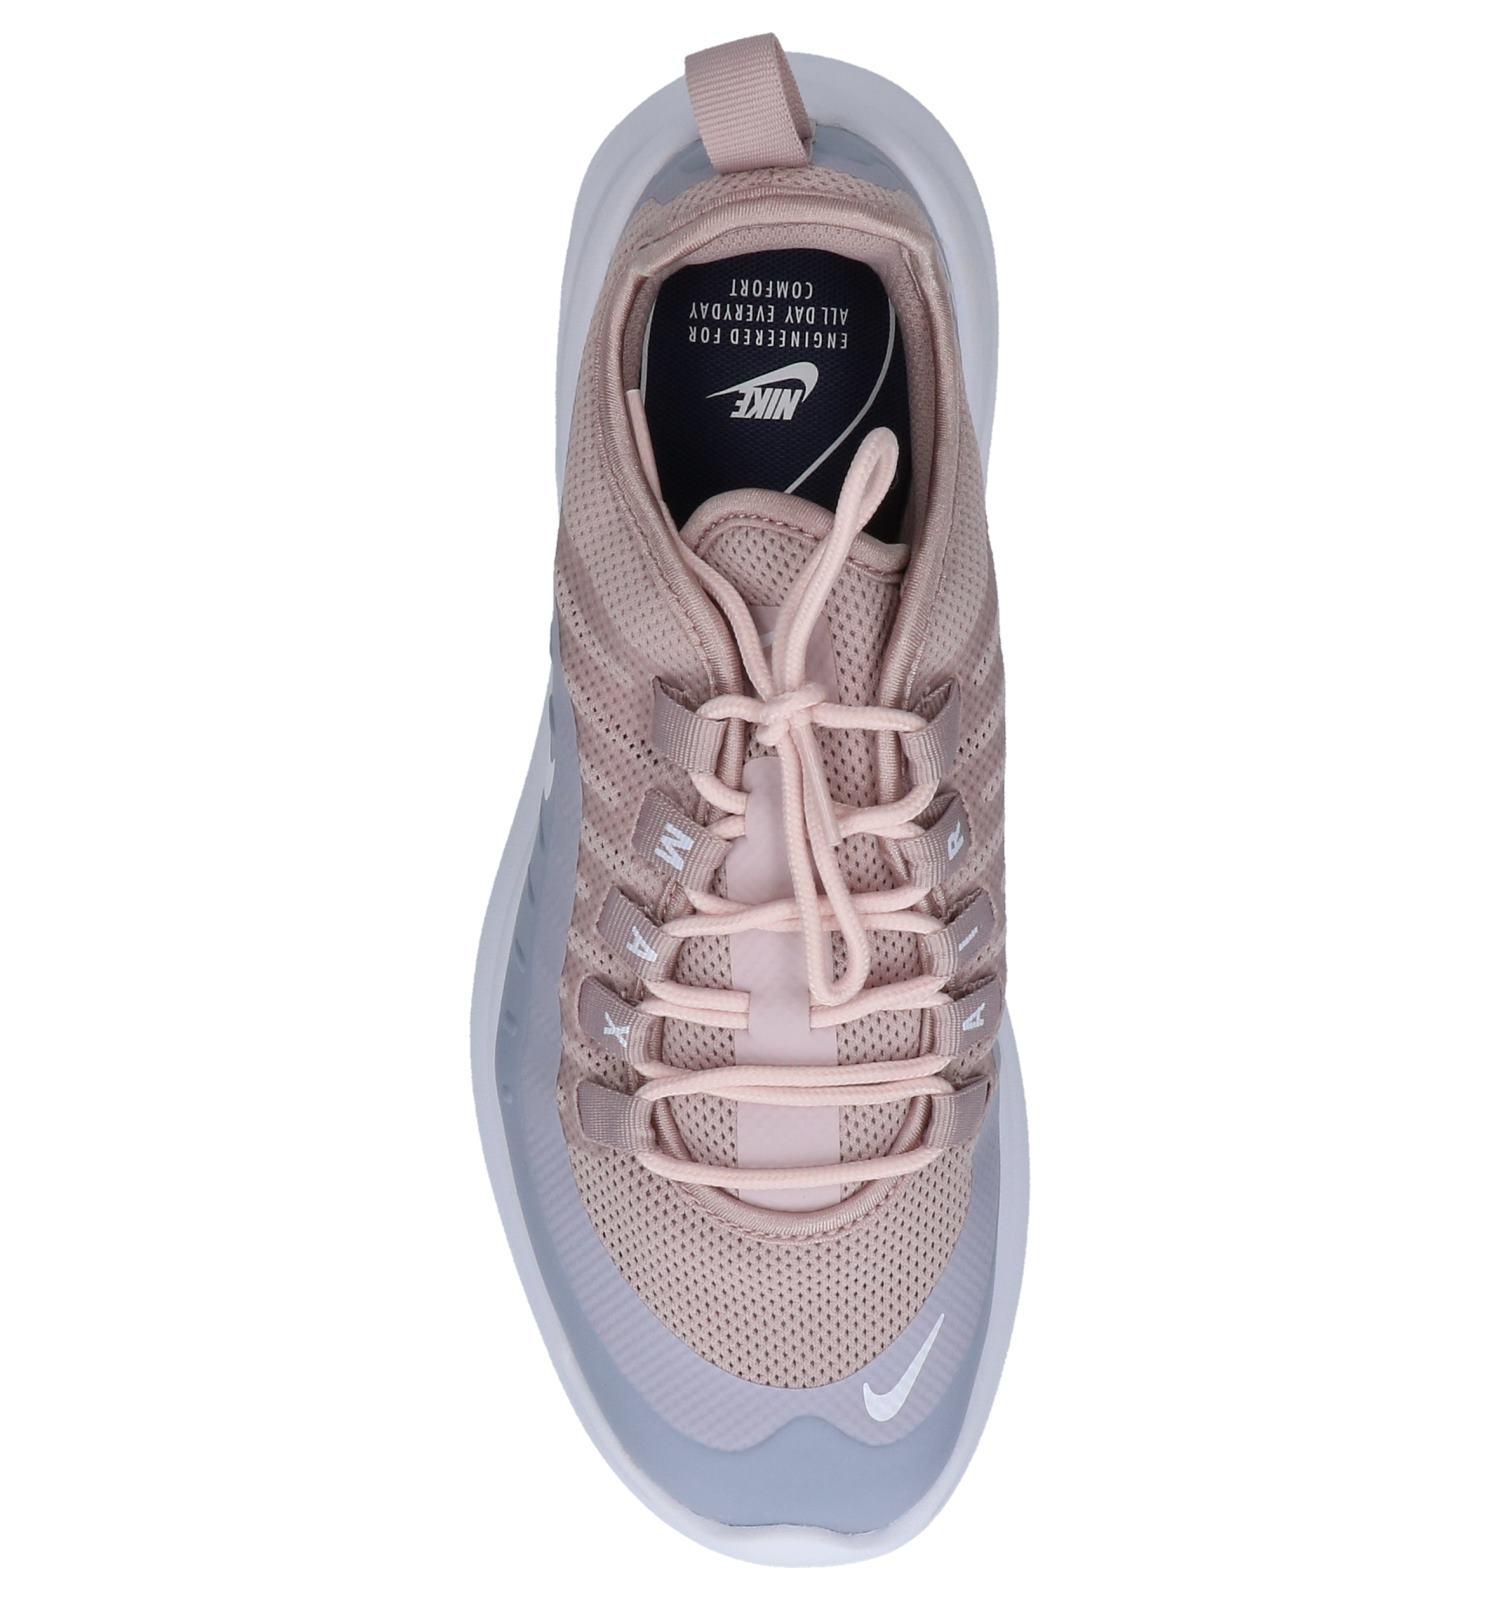 100% authentic e8206 e5fef Roze Runner Sneakers Nike Air Max Axis   TORFS.BE   Gratis verzend en retour